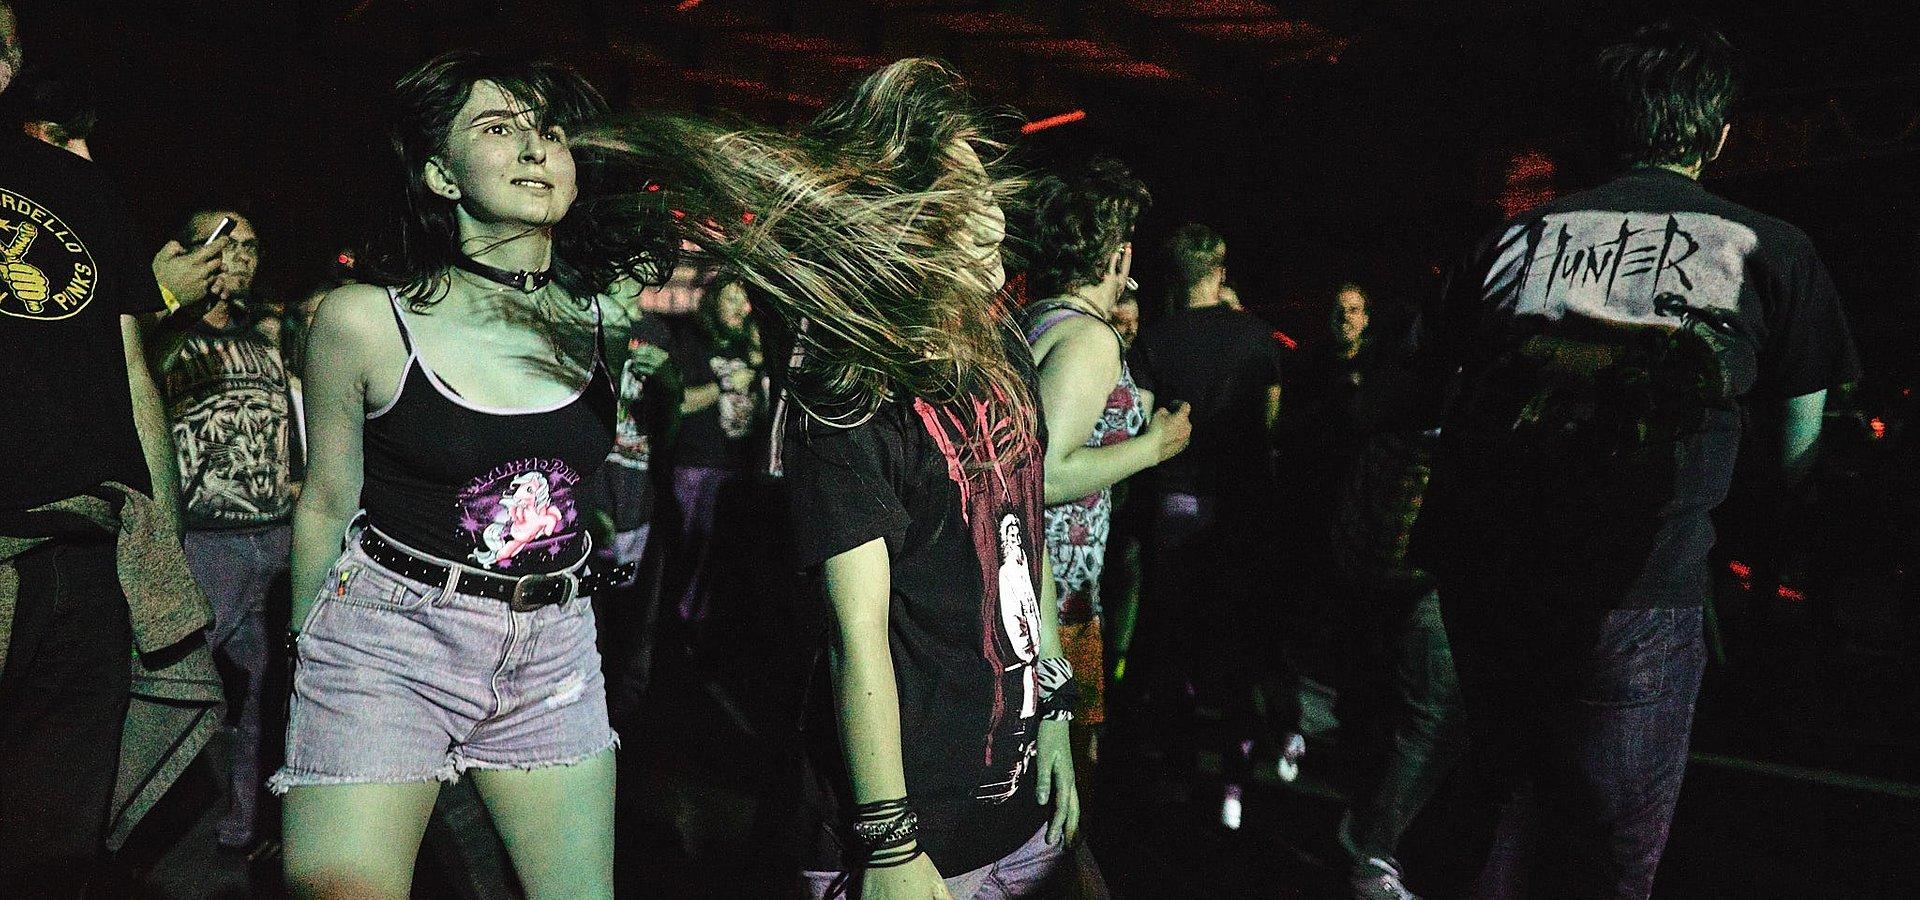 Akredytacje | Eliminacje do Pol'and'Rock Festival